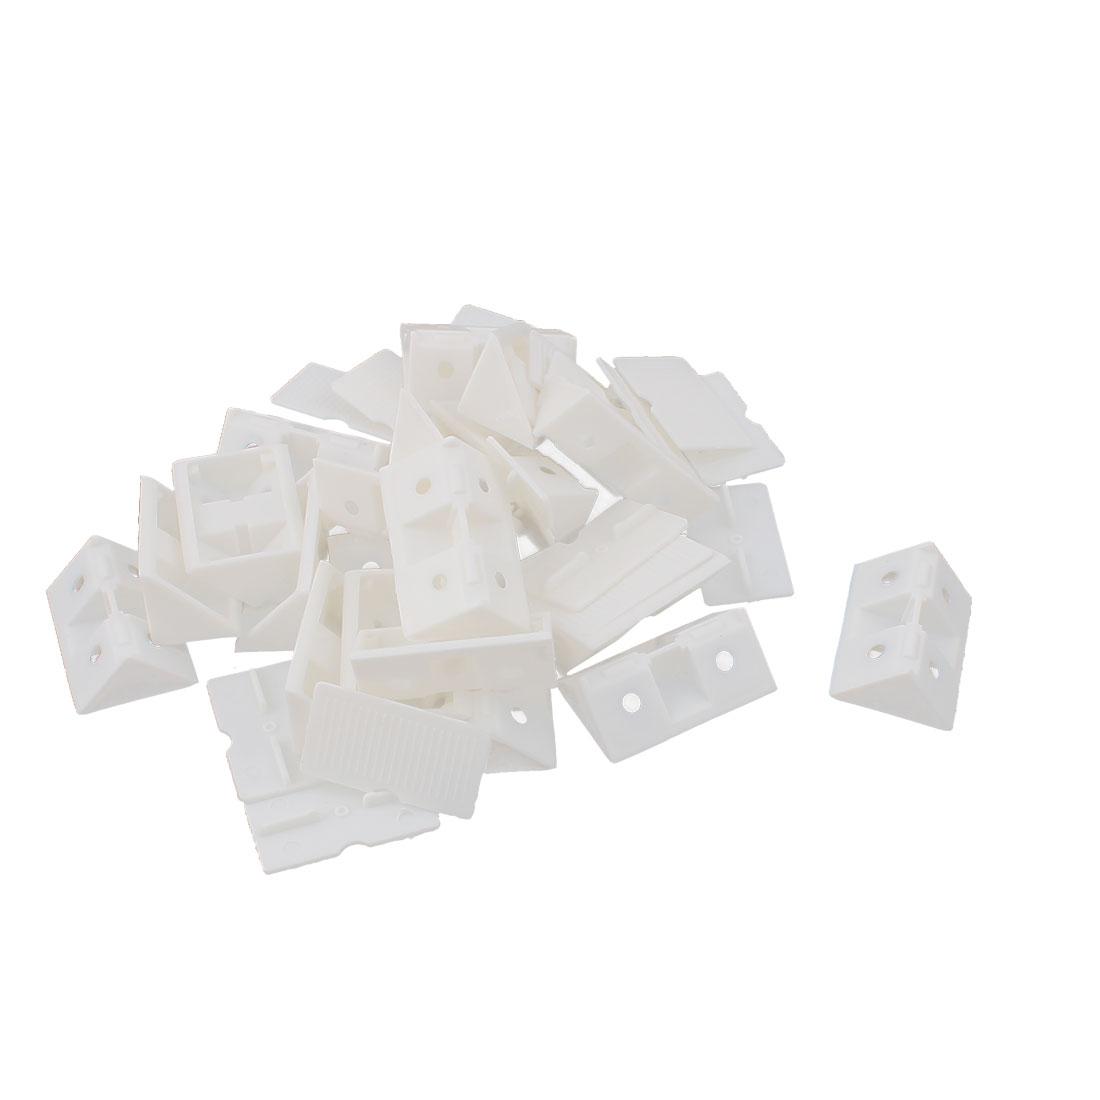 Shelf Closet Plastic Corner Brace Right Angle Bracket Furniture Assembly White 20pcs